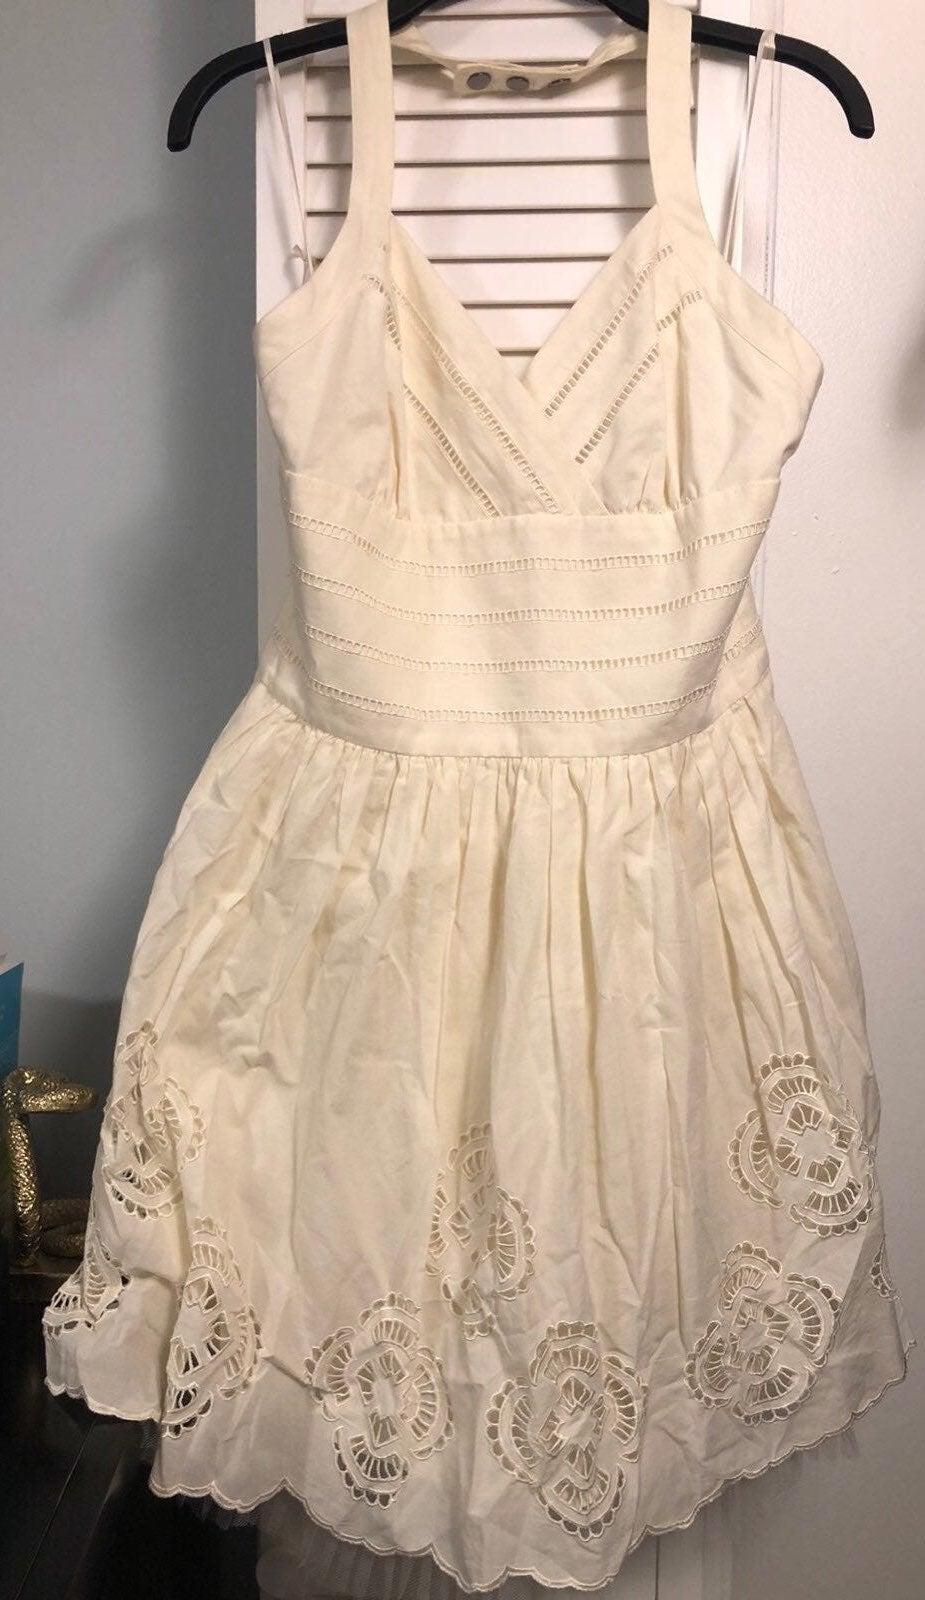 Jessica Simpson halter dress